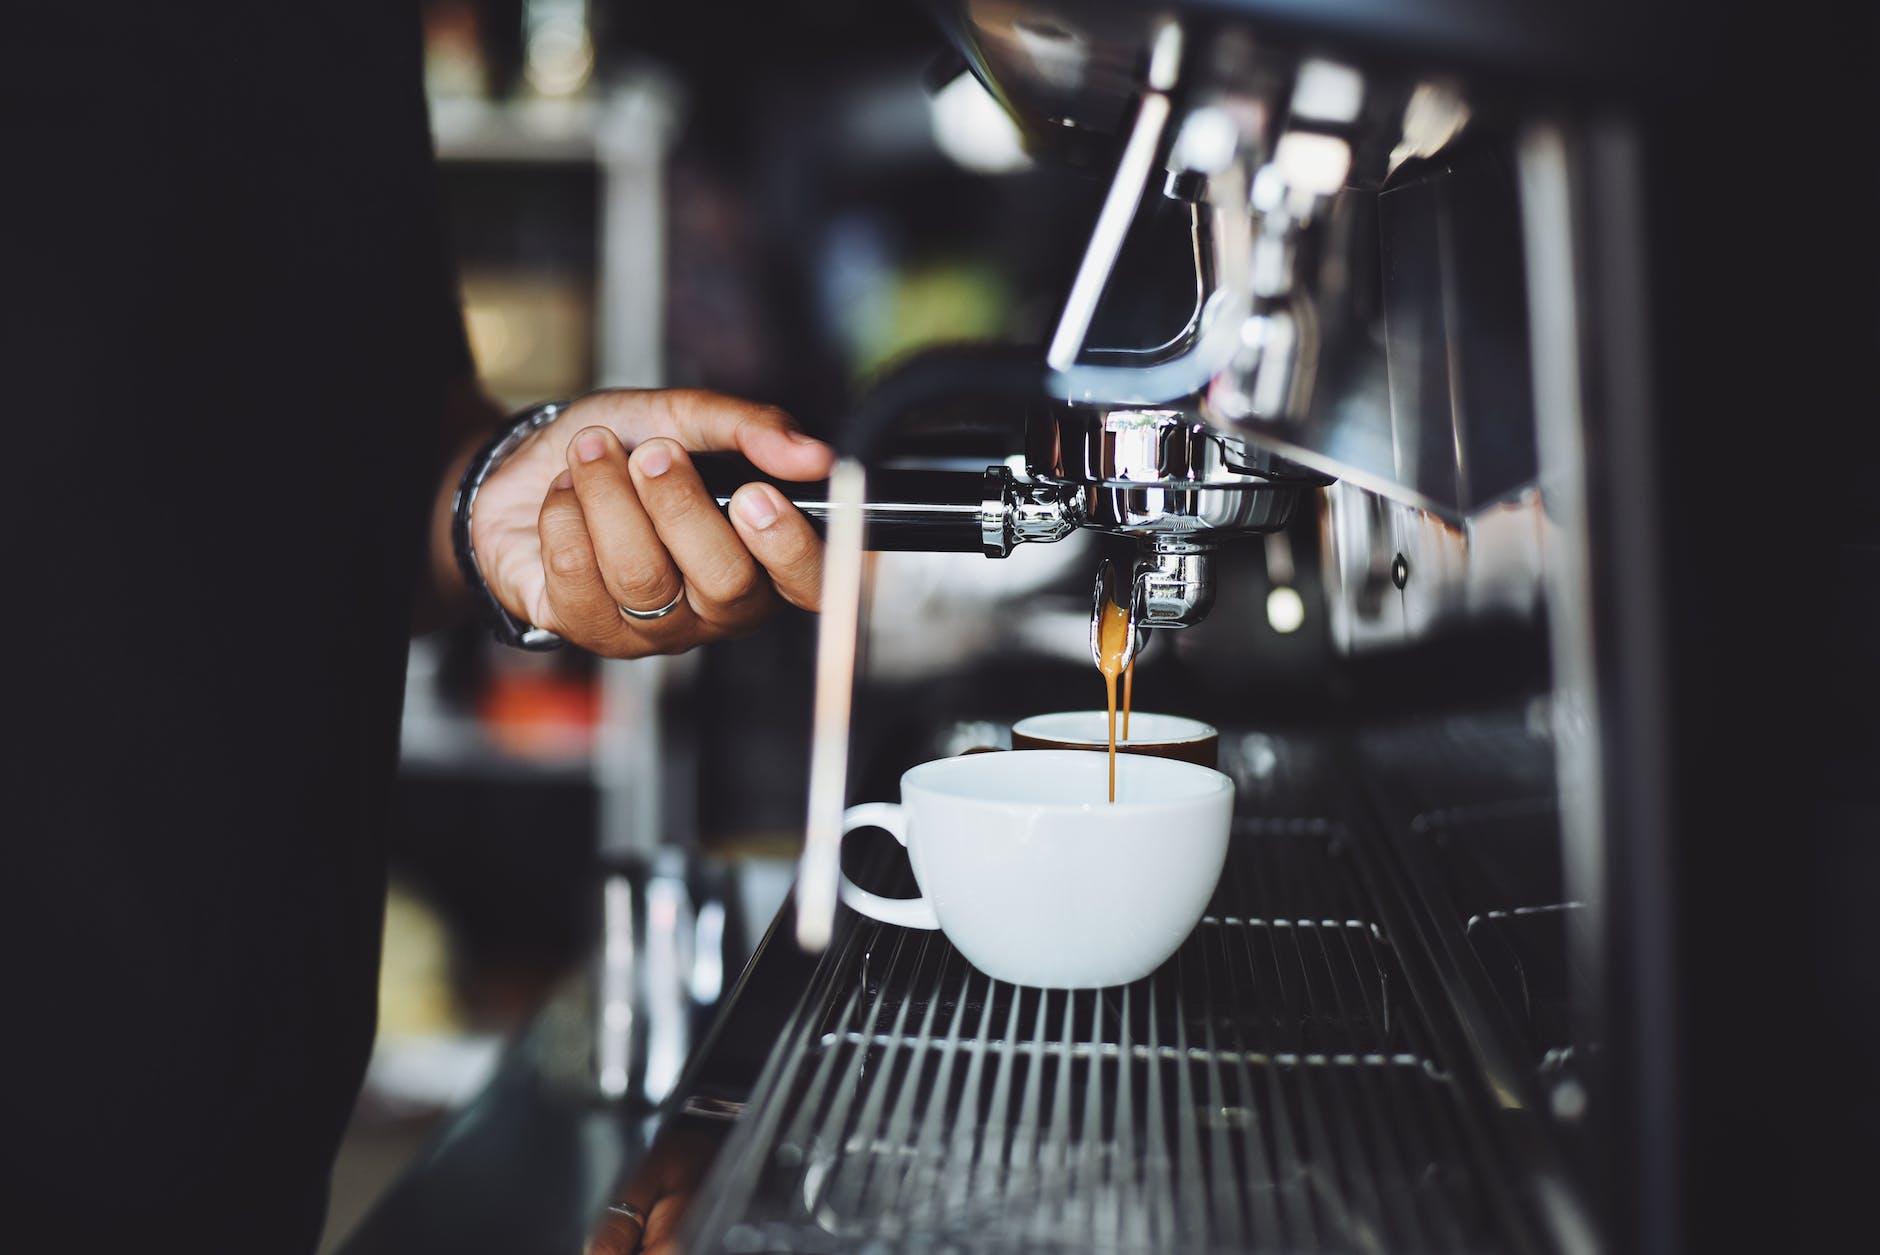 person using best nespresso machine for coffee